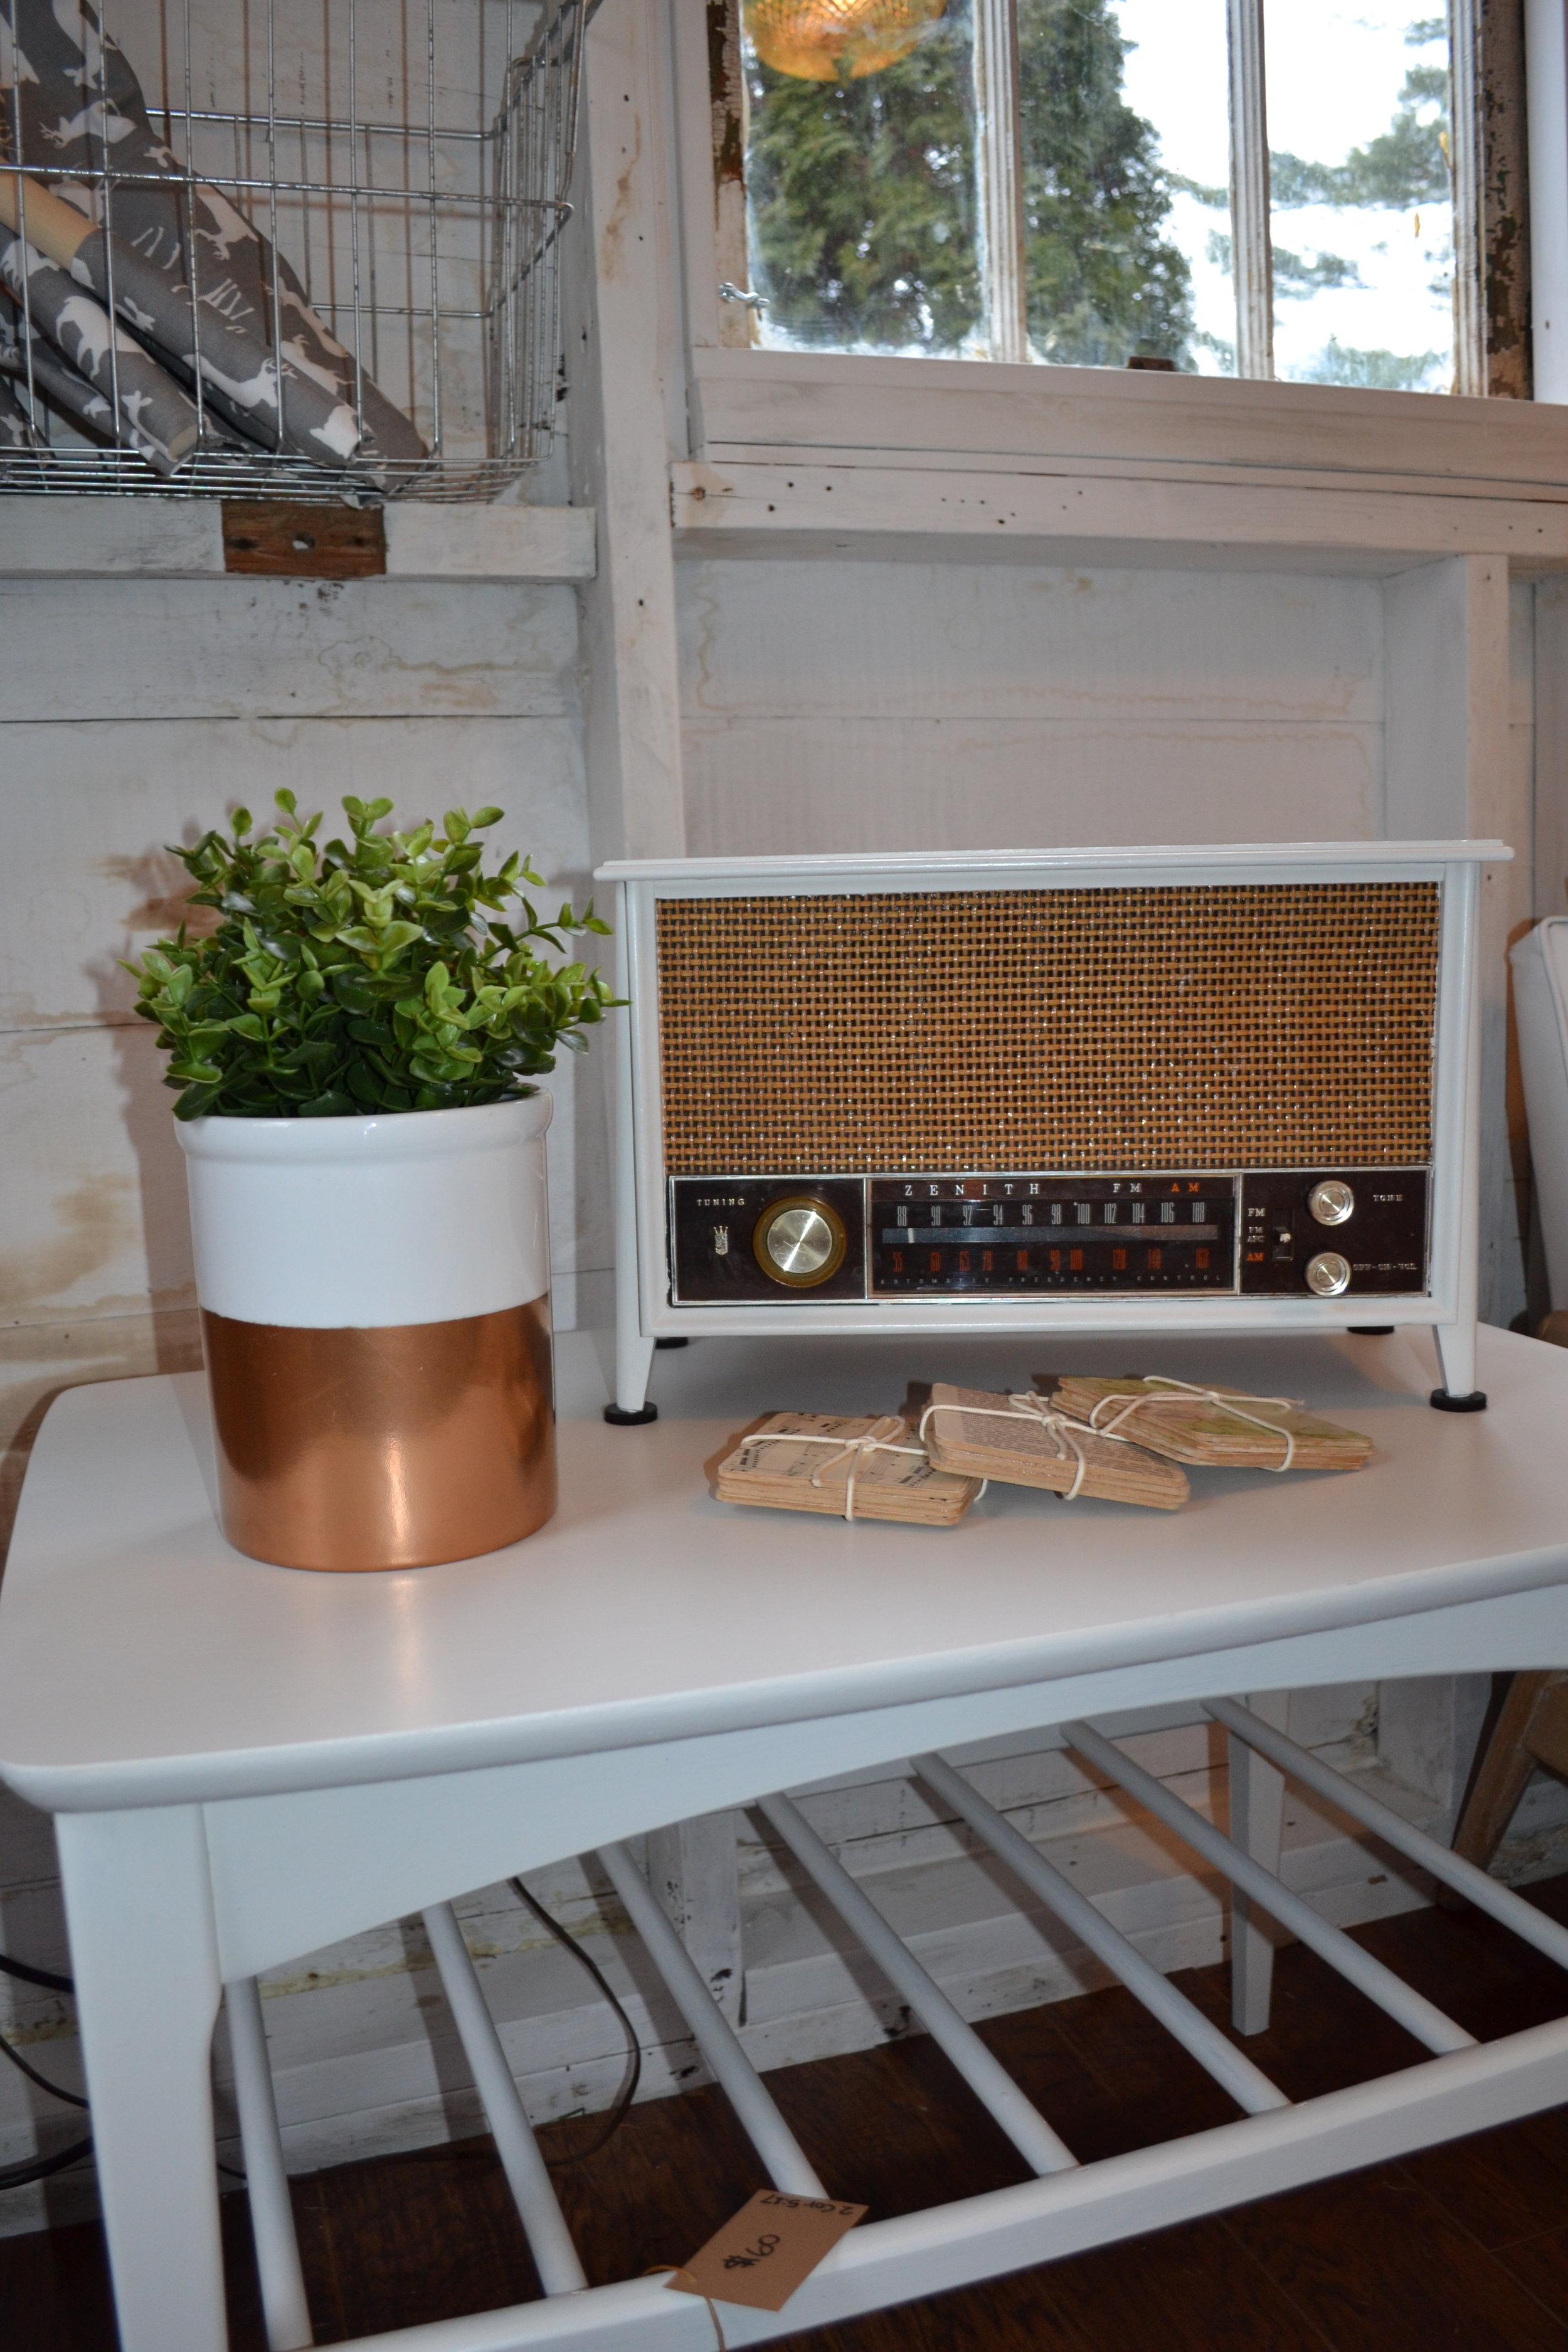 Yes, the radio still works!